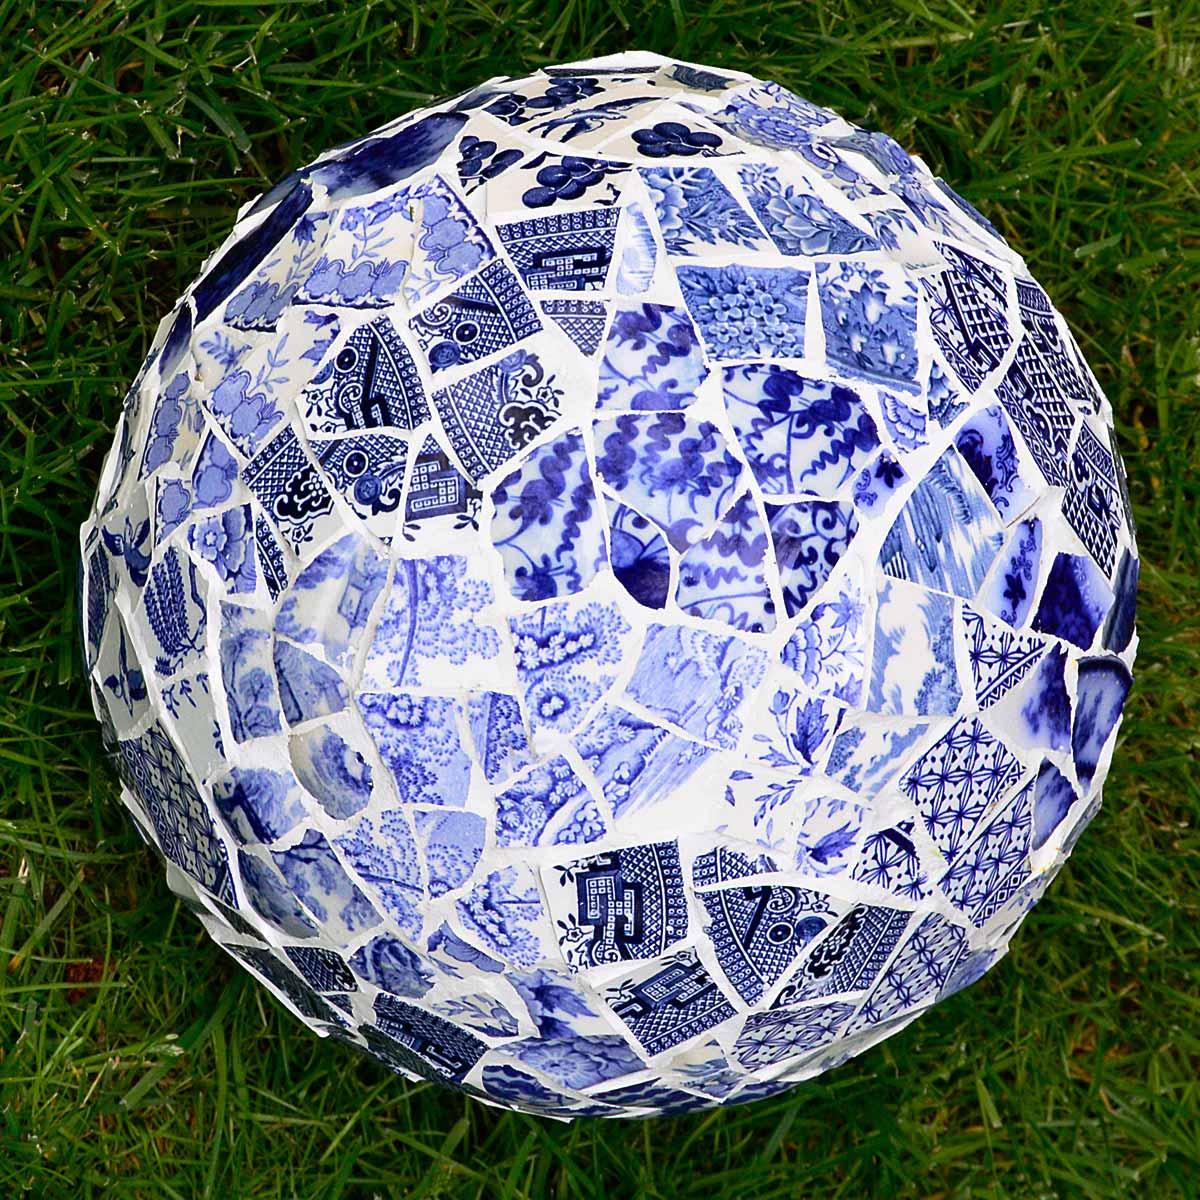 Mosaic Bowling Ball View 2